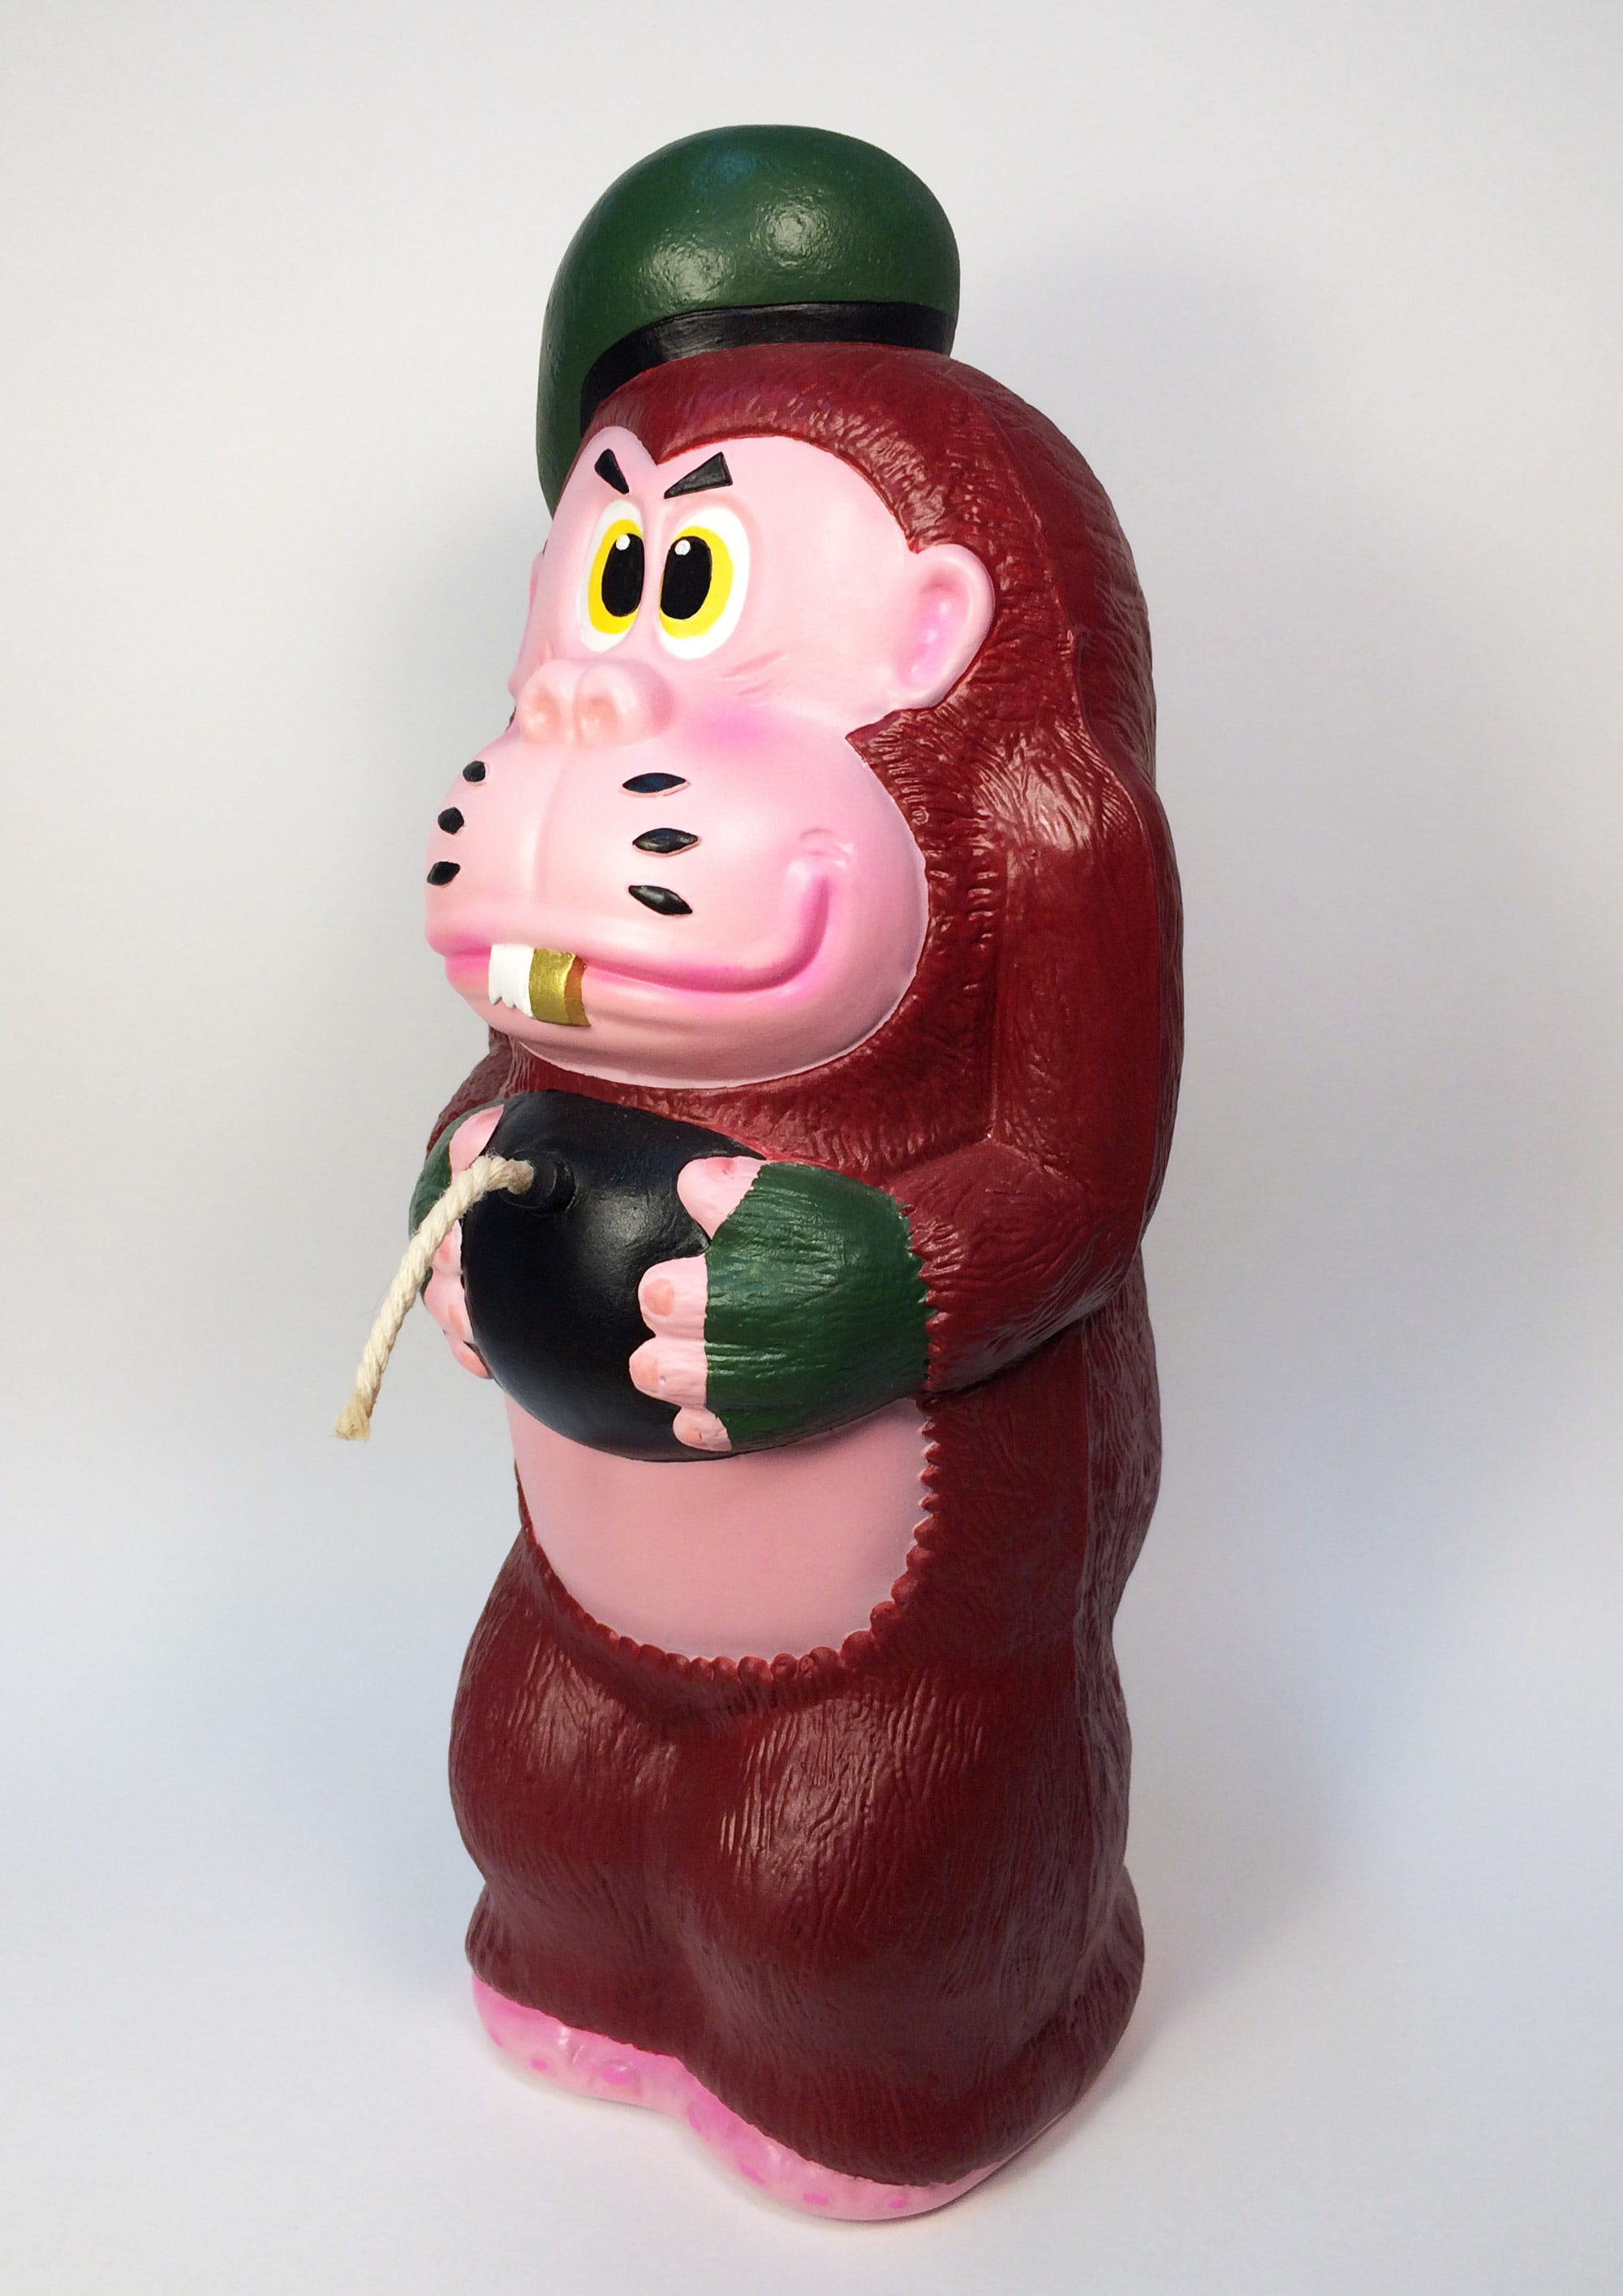 Gorilo Kongo Watdafac Toys Art Toys Resin